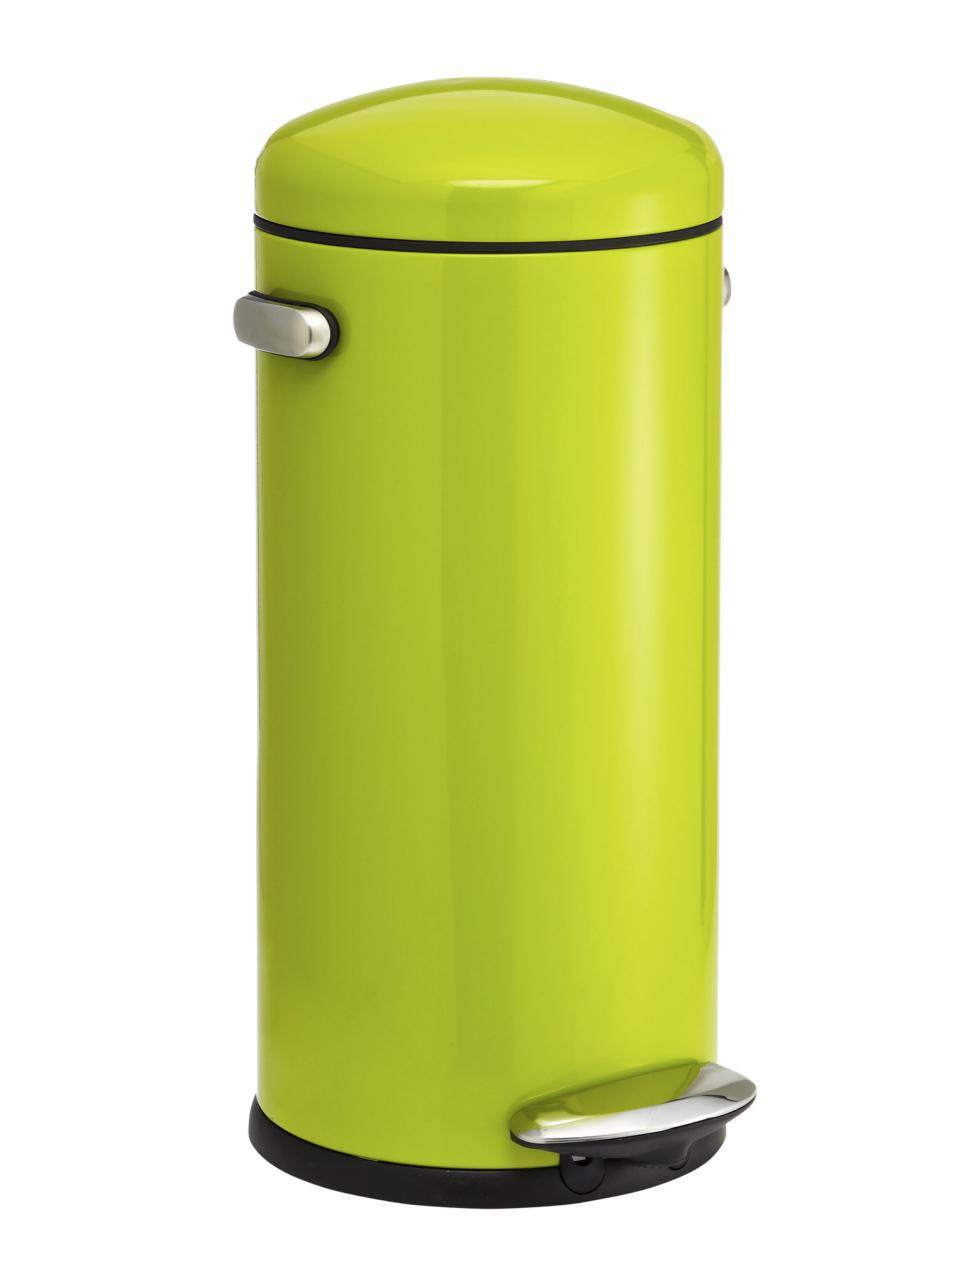 quick + colorful kitchen accessories from hgtv magazine | hgtv